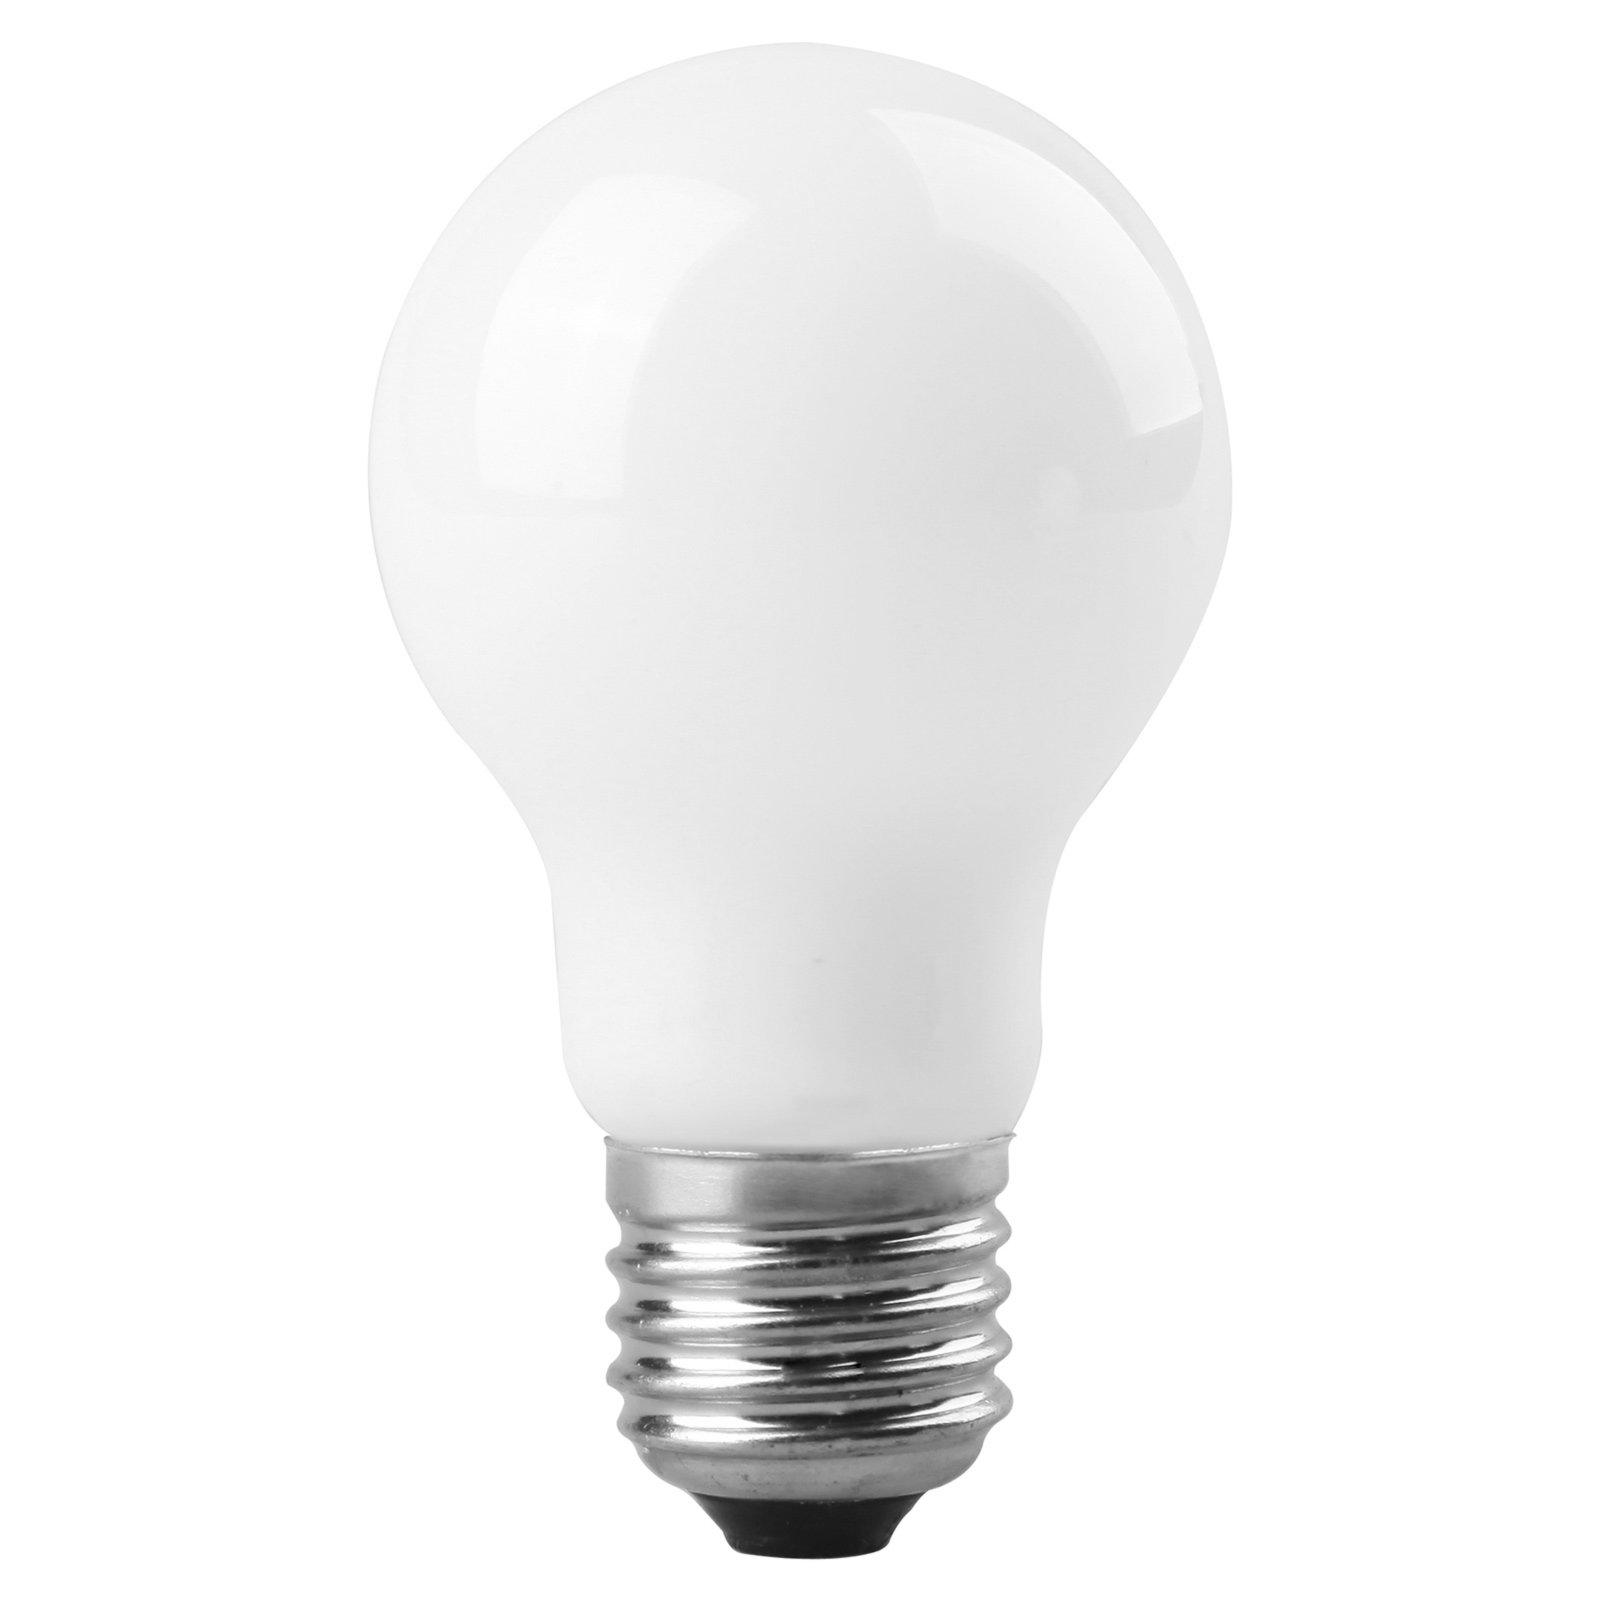 led leuchtmittel nostalgia lightme e27 6 watt warmwei led leuchtmittel leuchtmittel. Black Bedroom Furniture Sets. Home Design Ideas